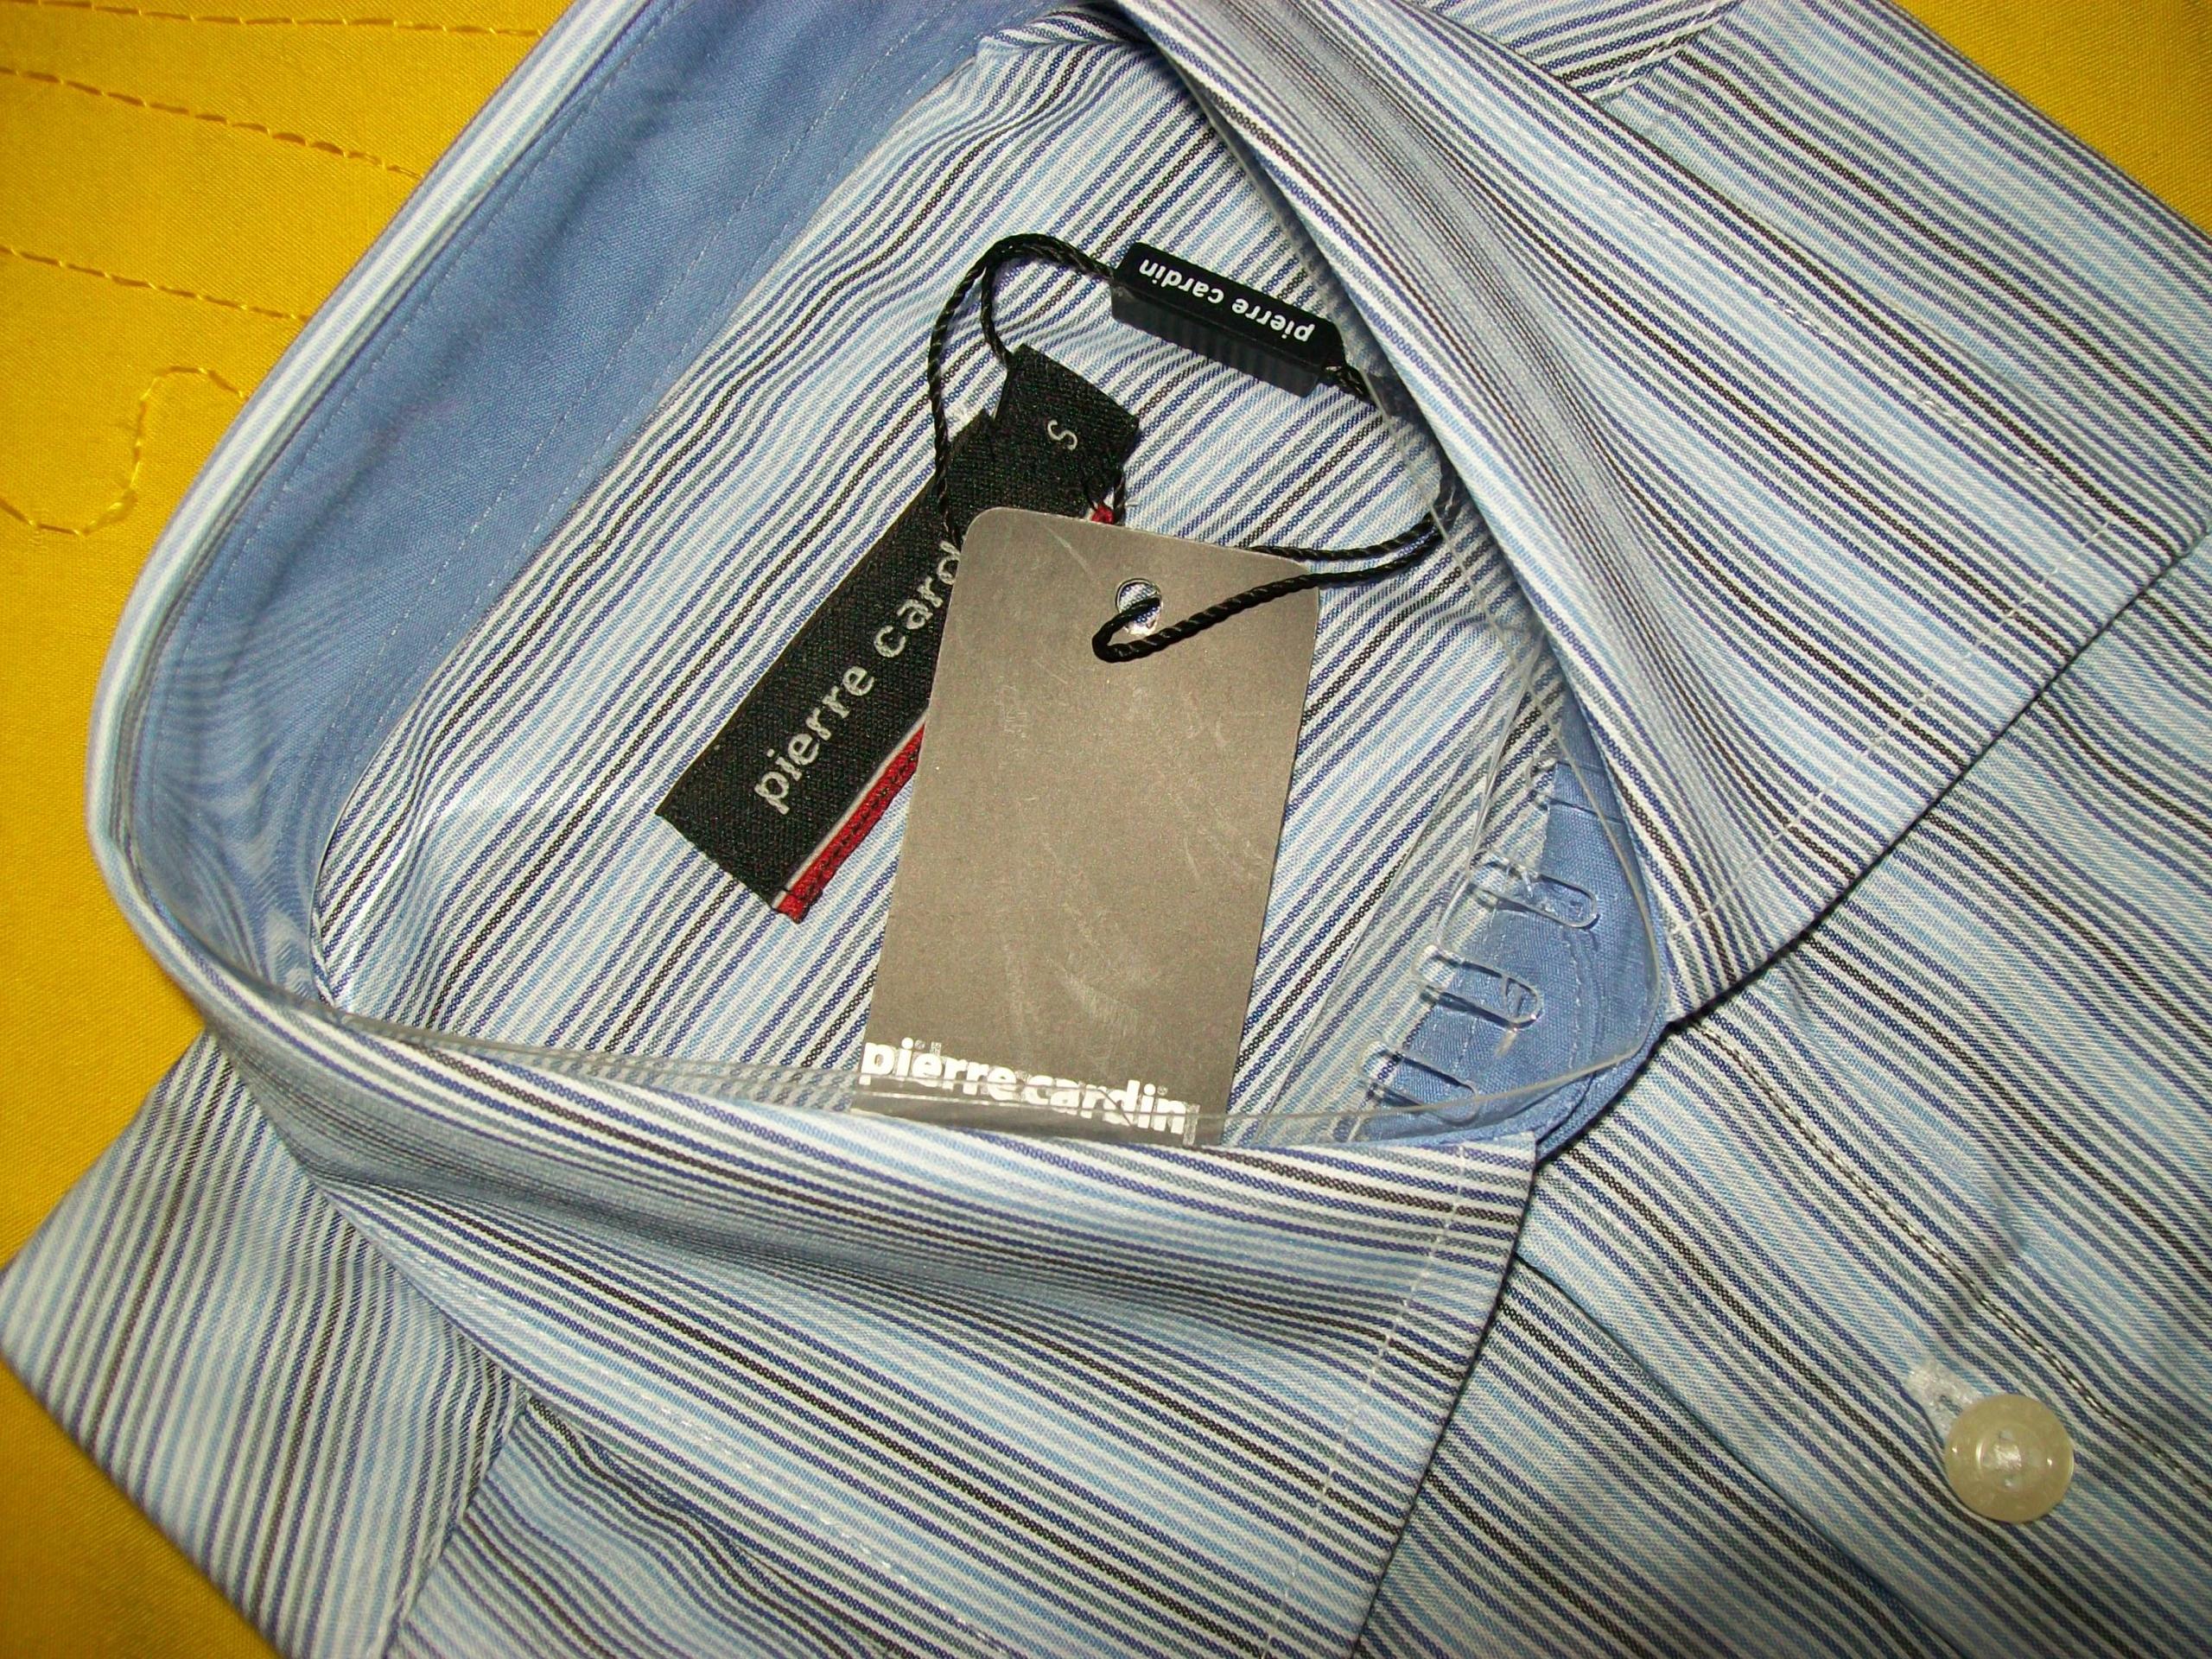 PIERRE CARDIN elegancka koszula paseczki S